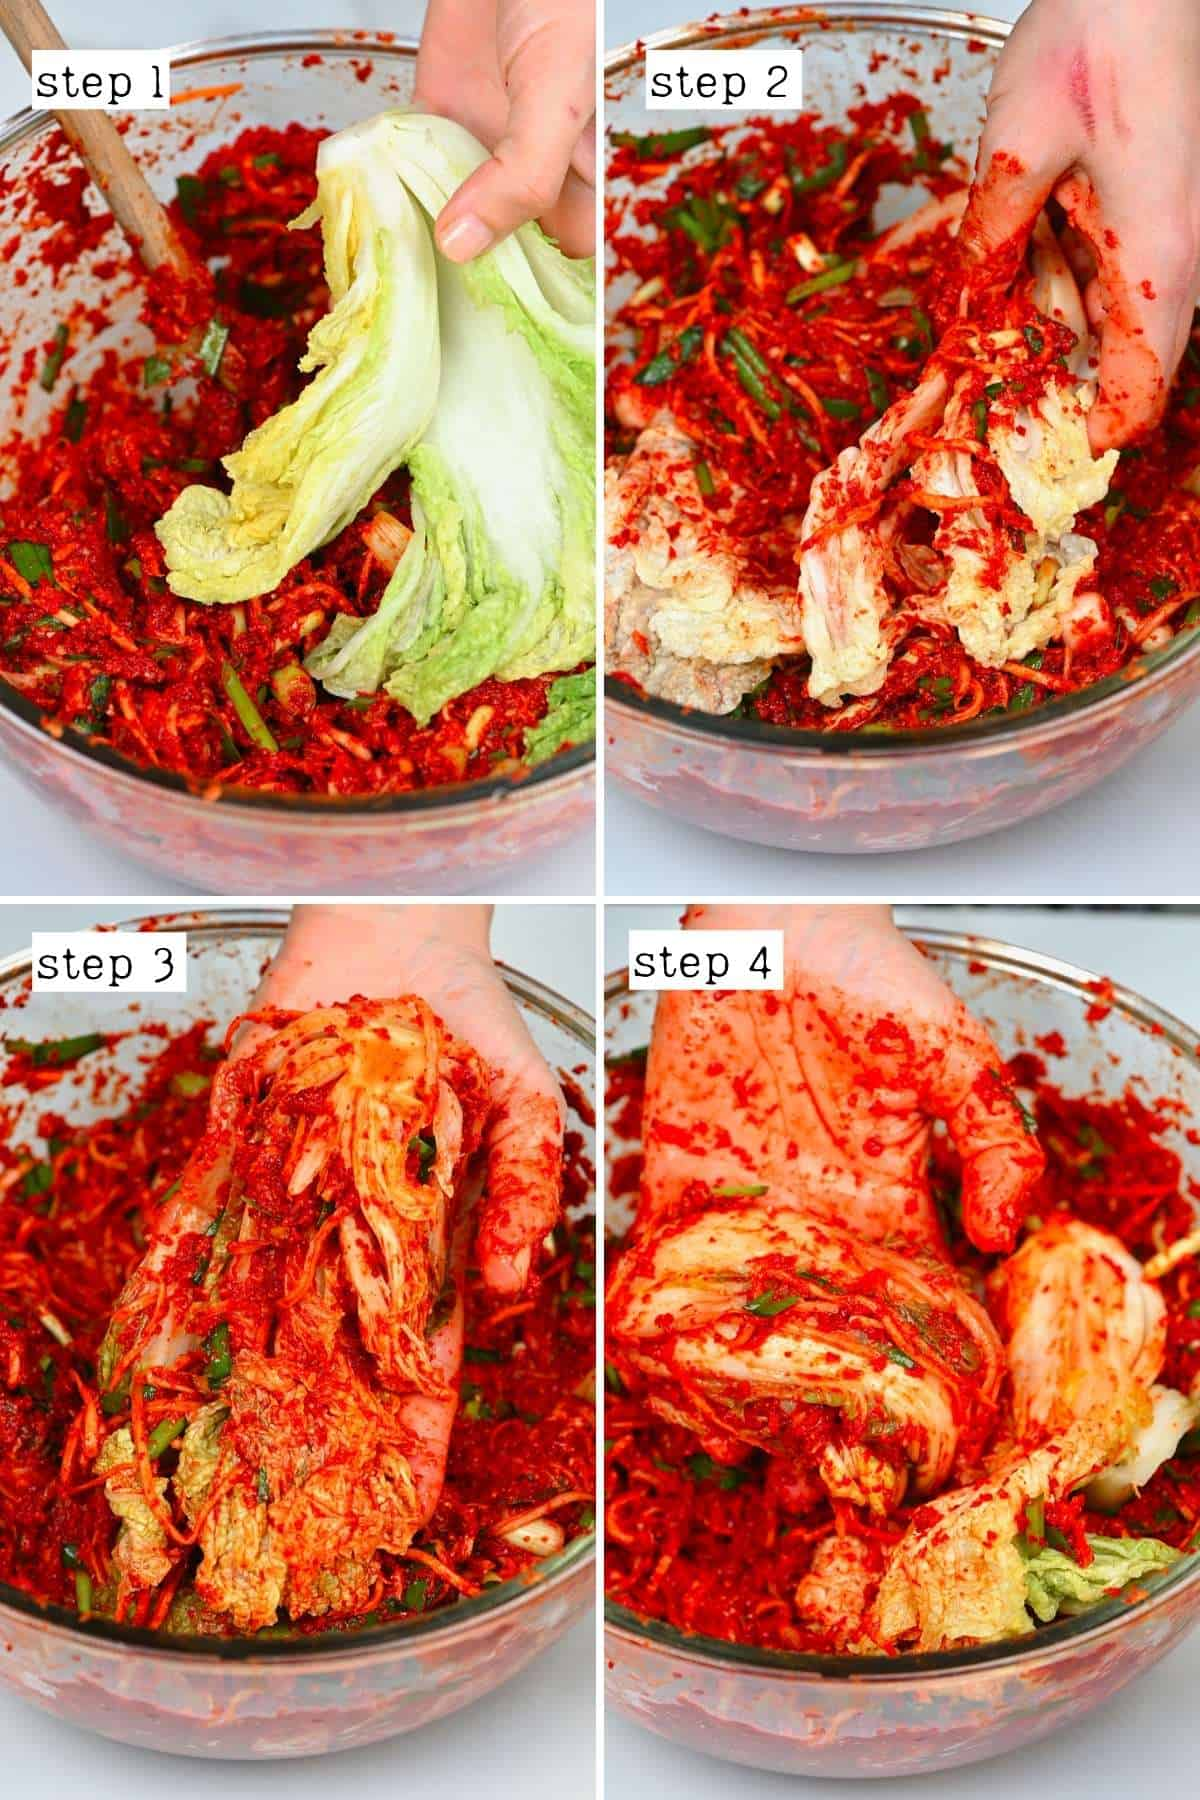 Steps for making kimchi